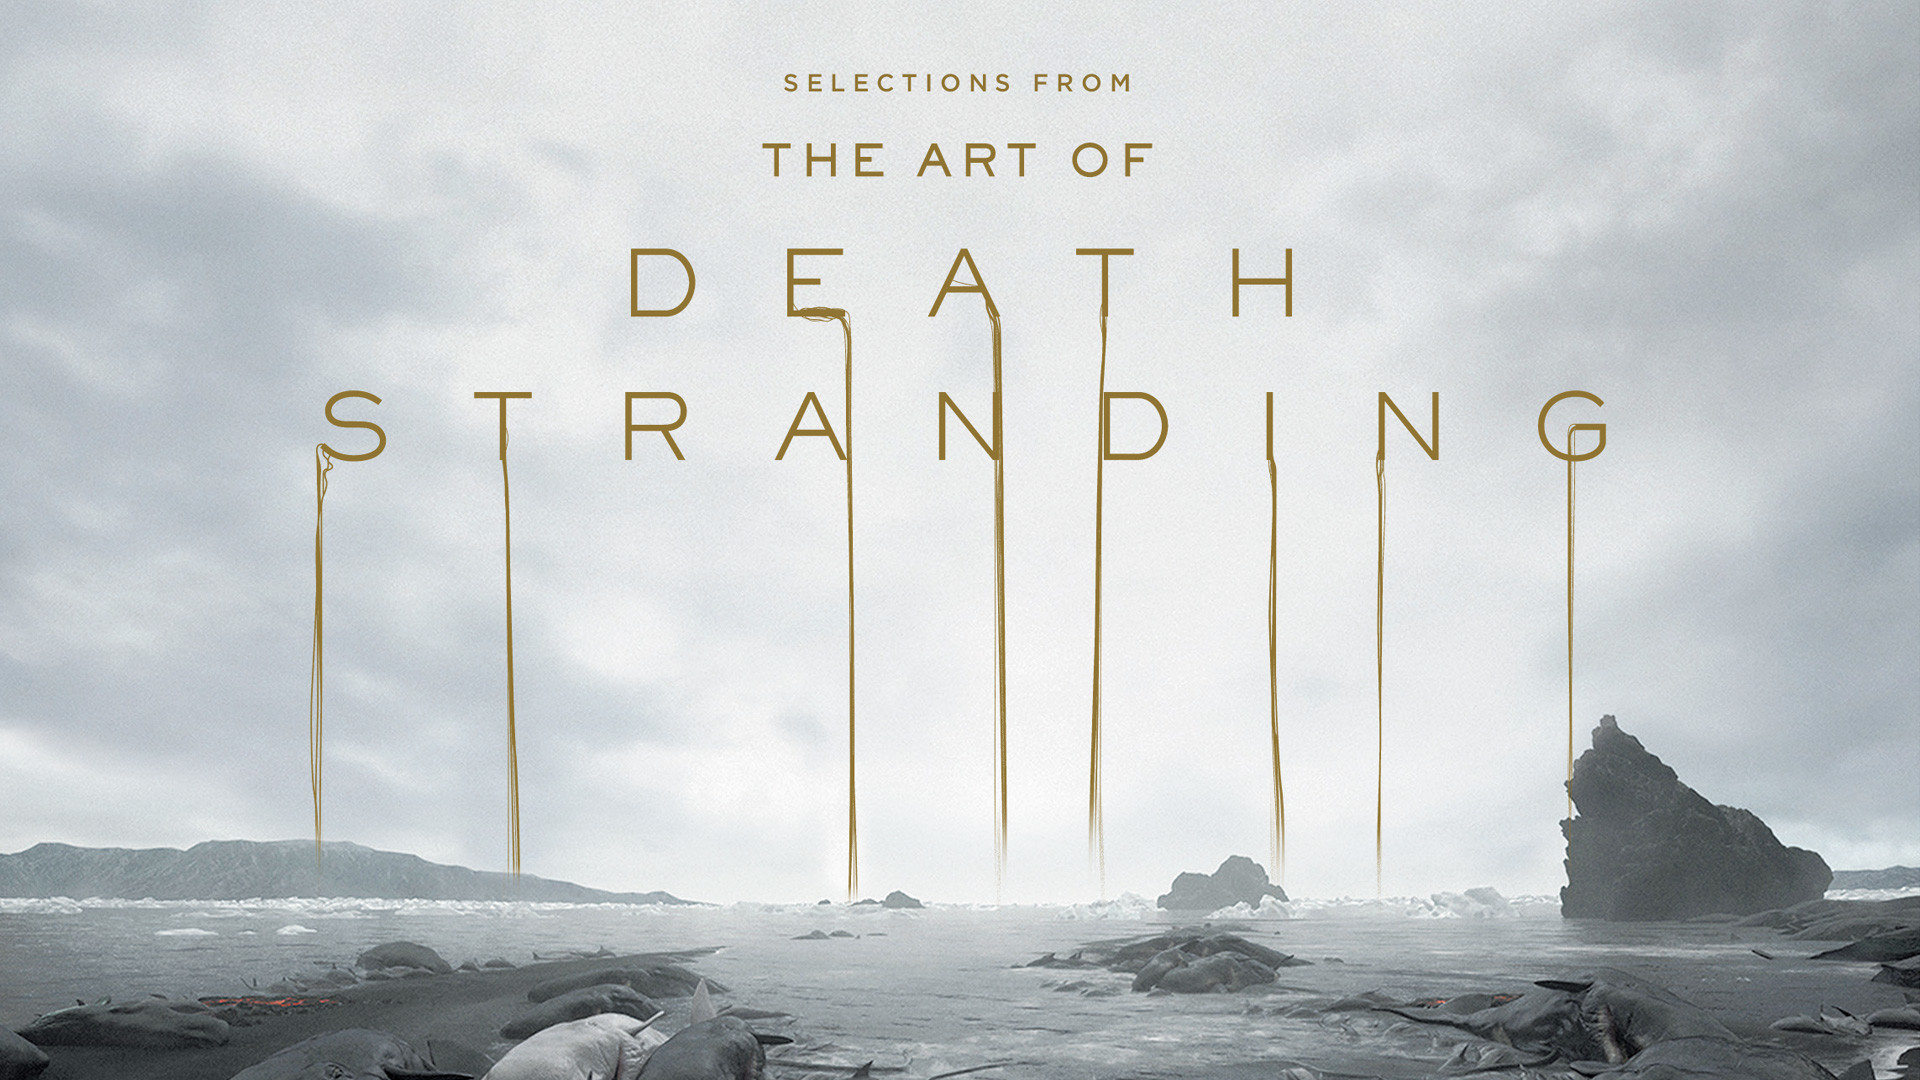 DEATH STRANDING Digital Art Book on Steam